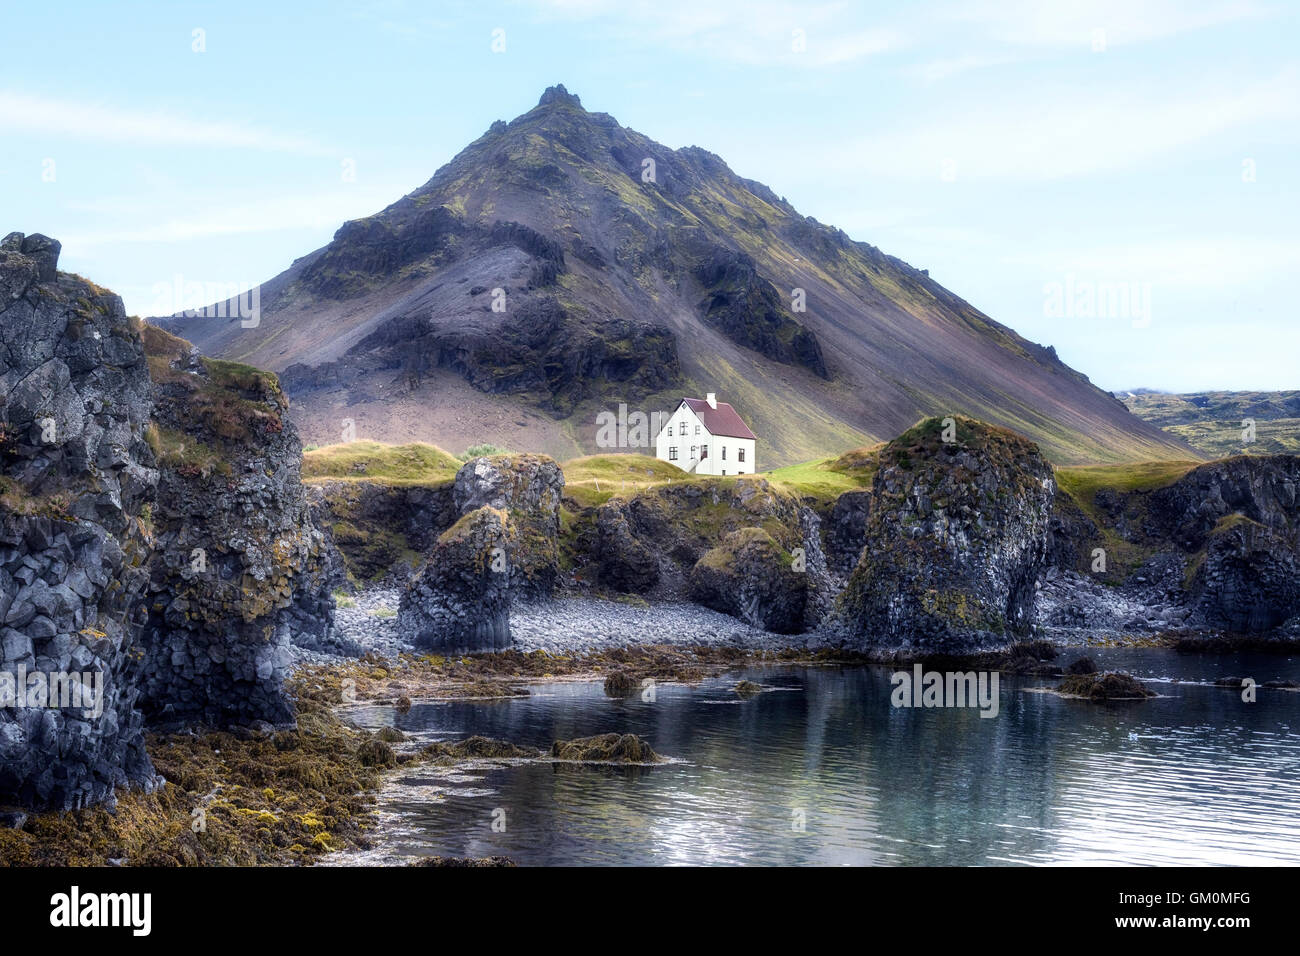 Arnastapi, Hellnar, Snaefellsnes, Iceland - Stock Image